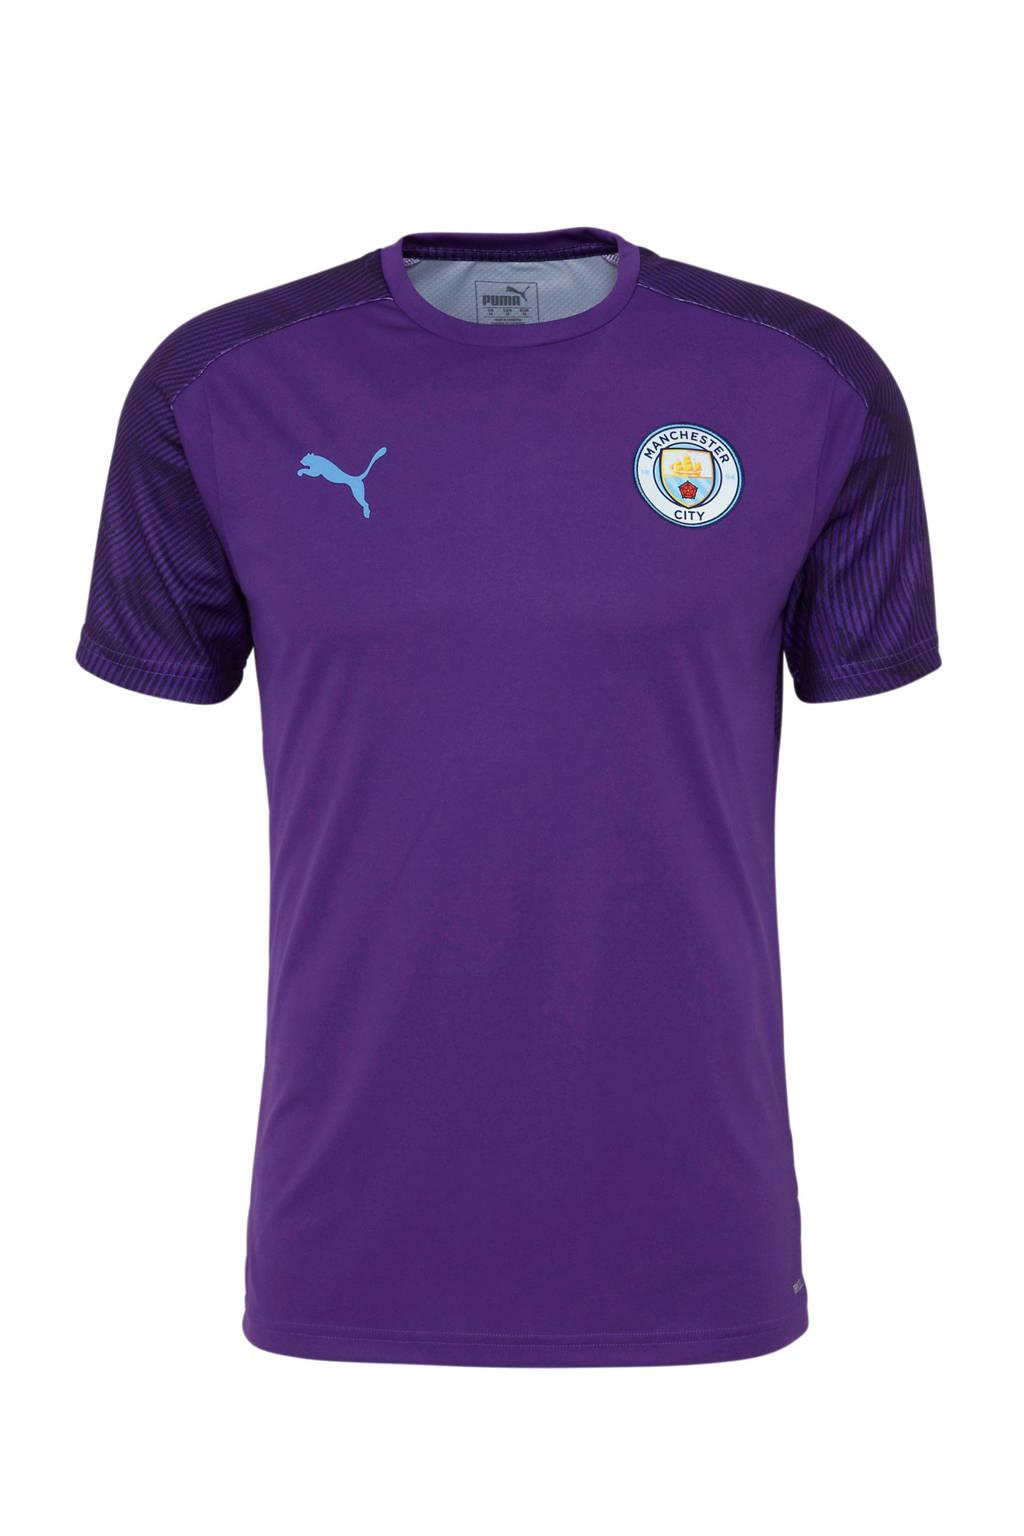 Puma Senior Manchester City voetbalshirt Training, Paars